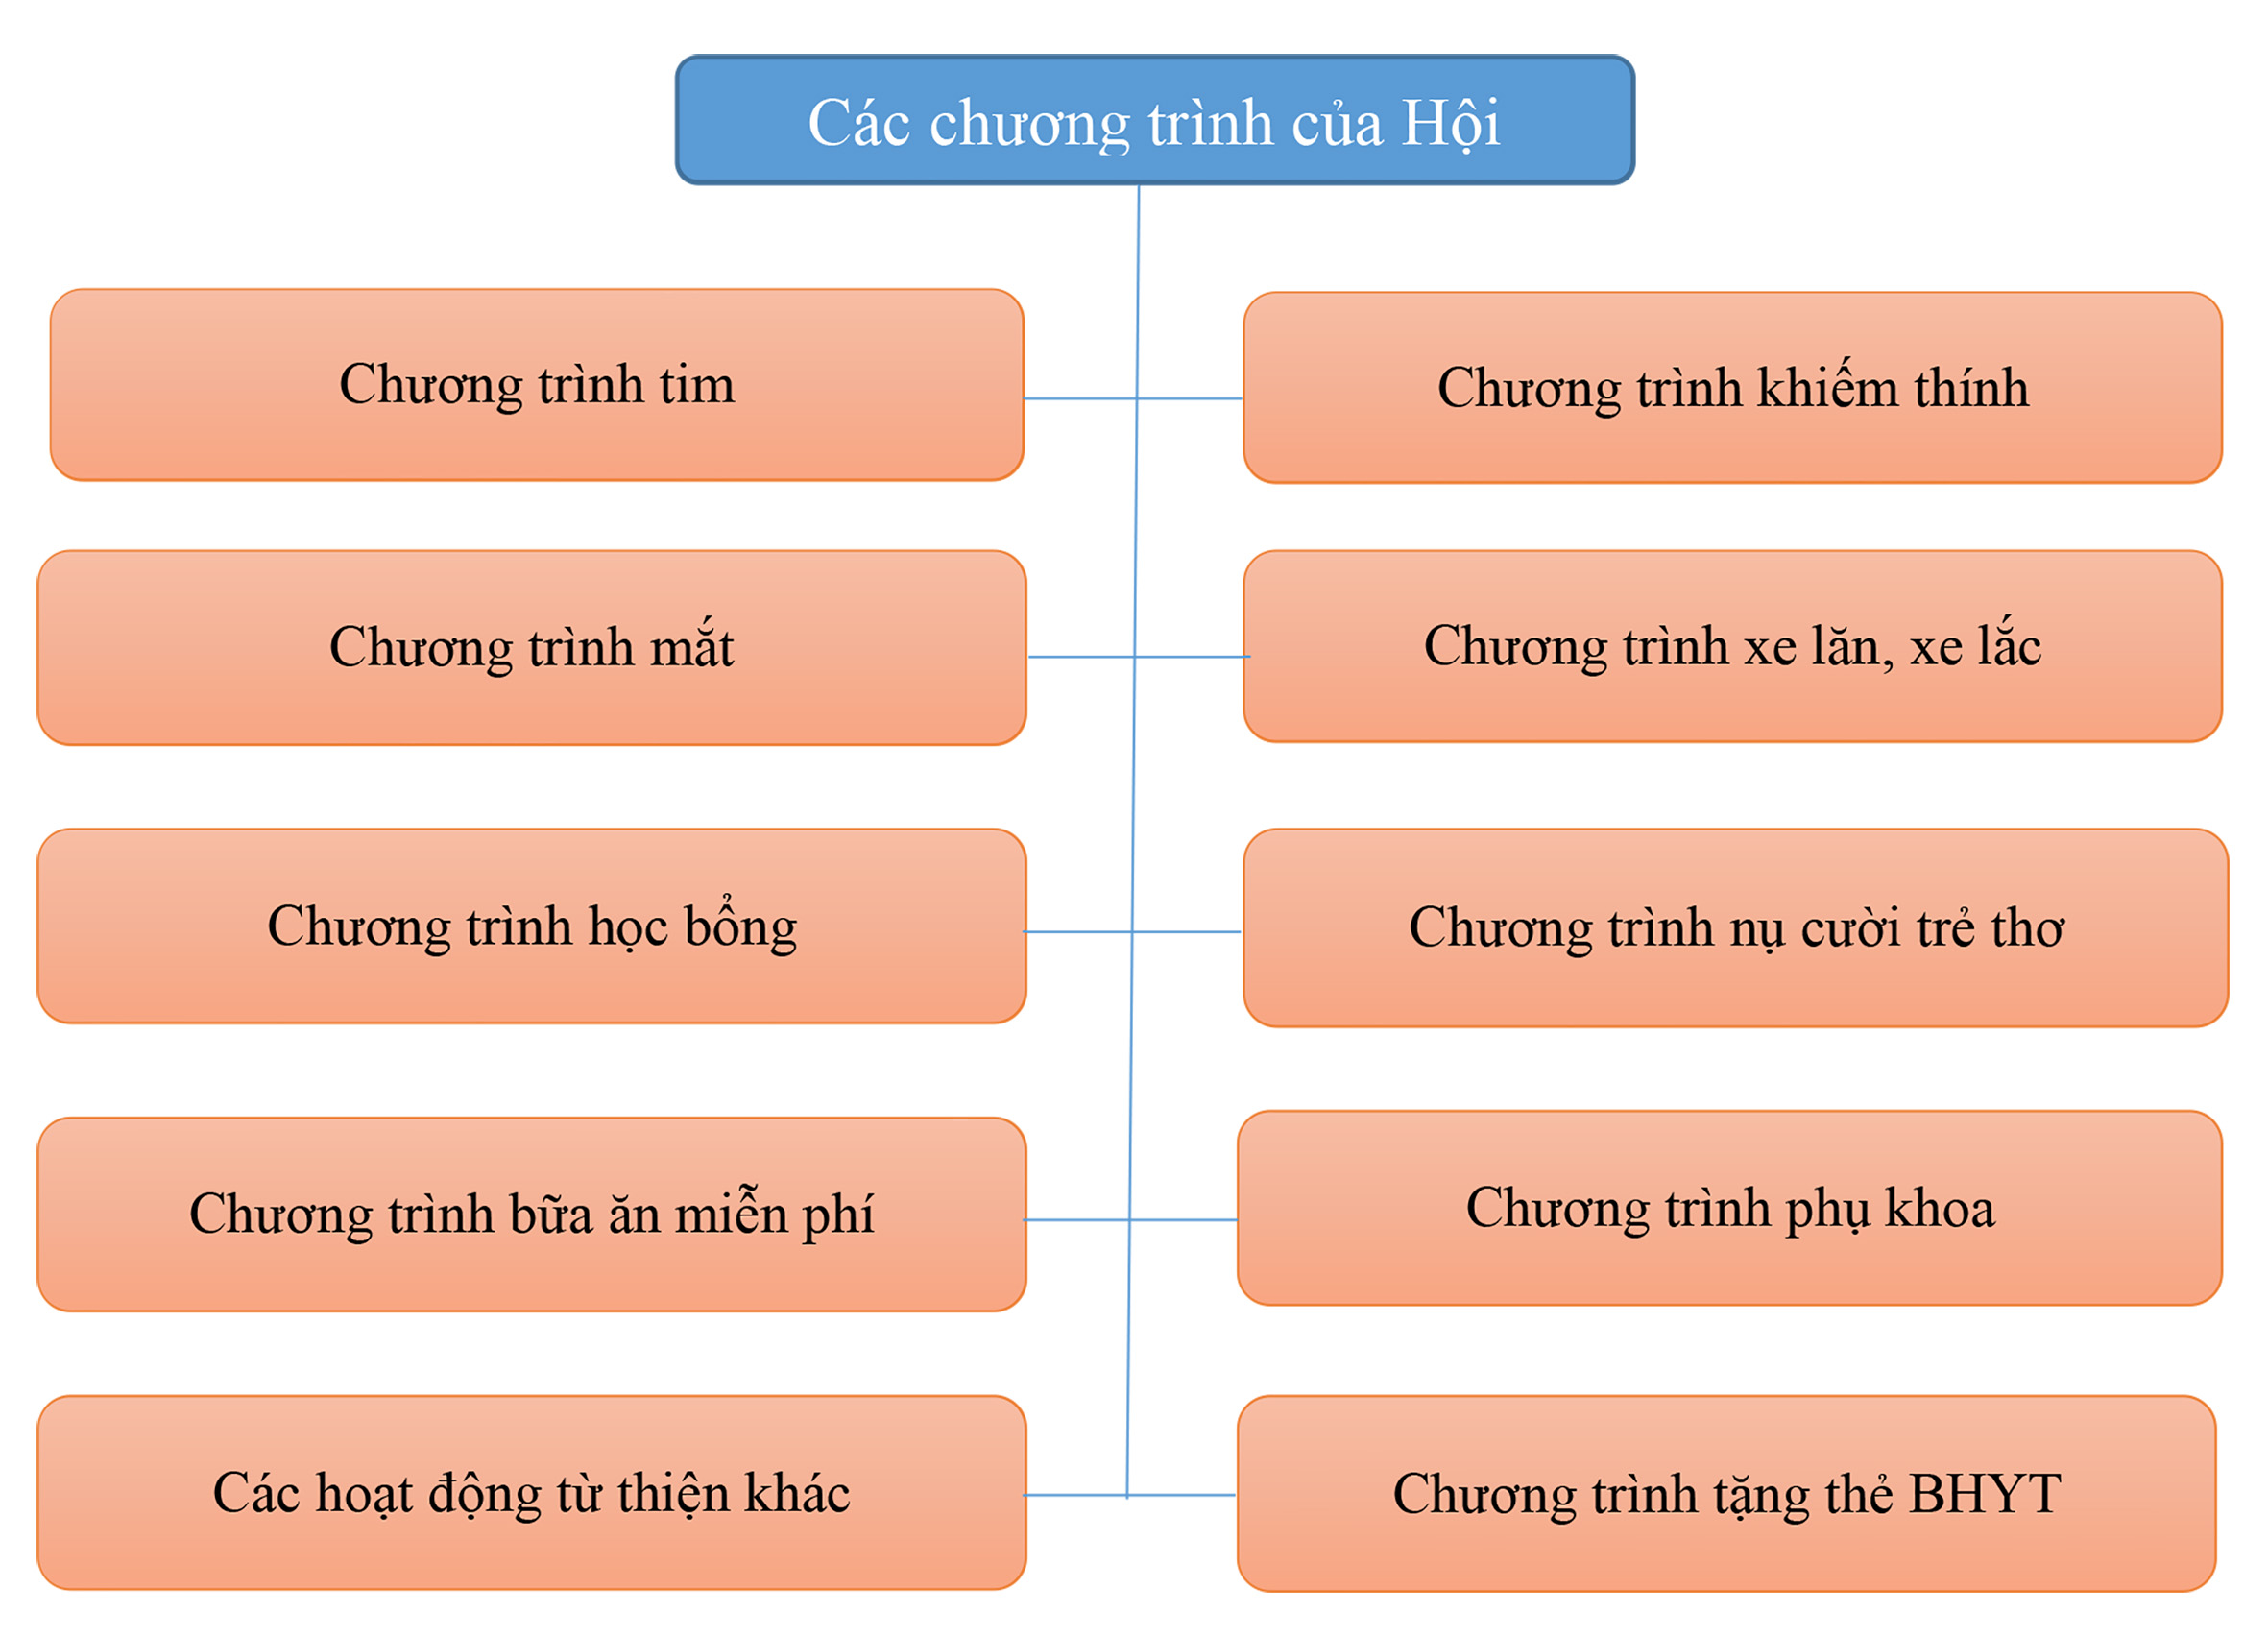 cac chuong trinh cua Hoi, 26-6